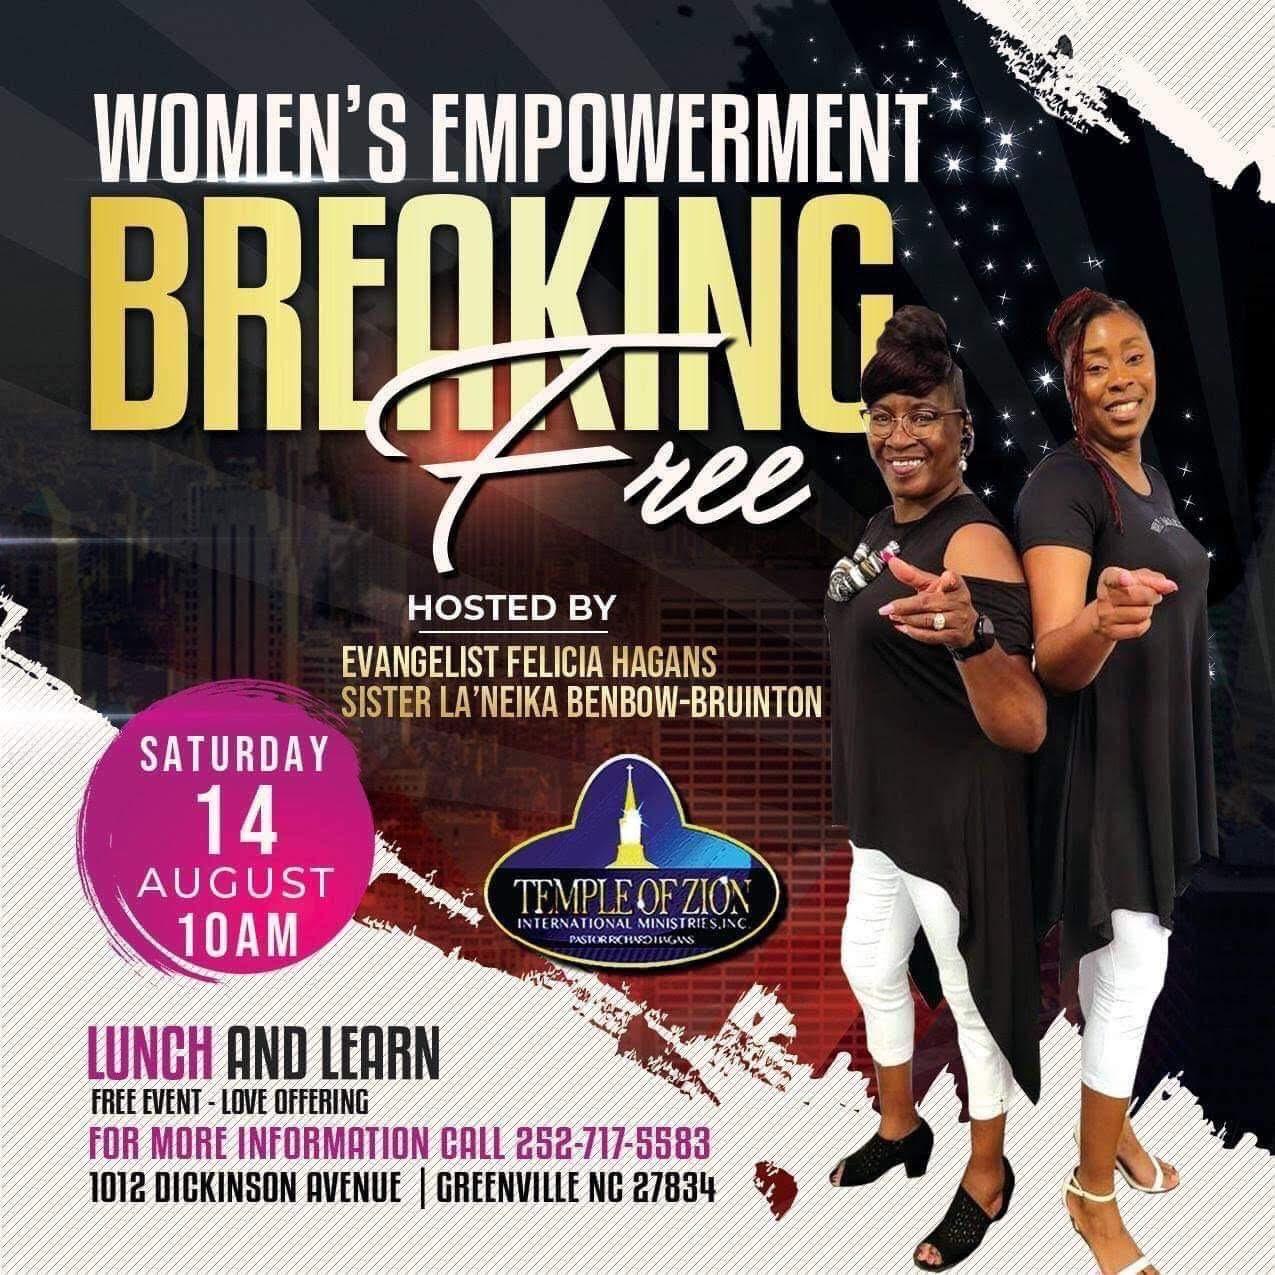 Women's Empowerment Breaking Free, August 14th